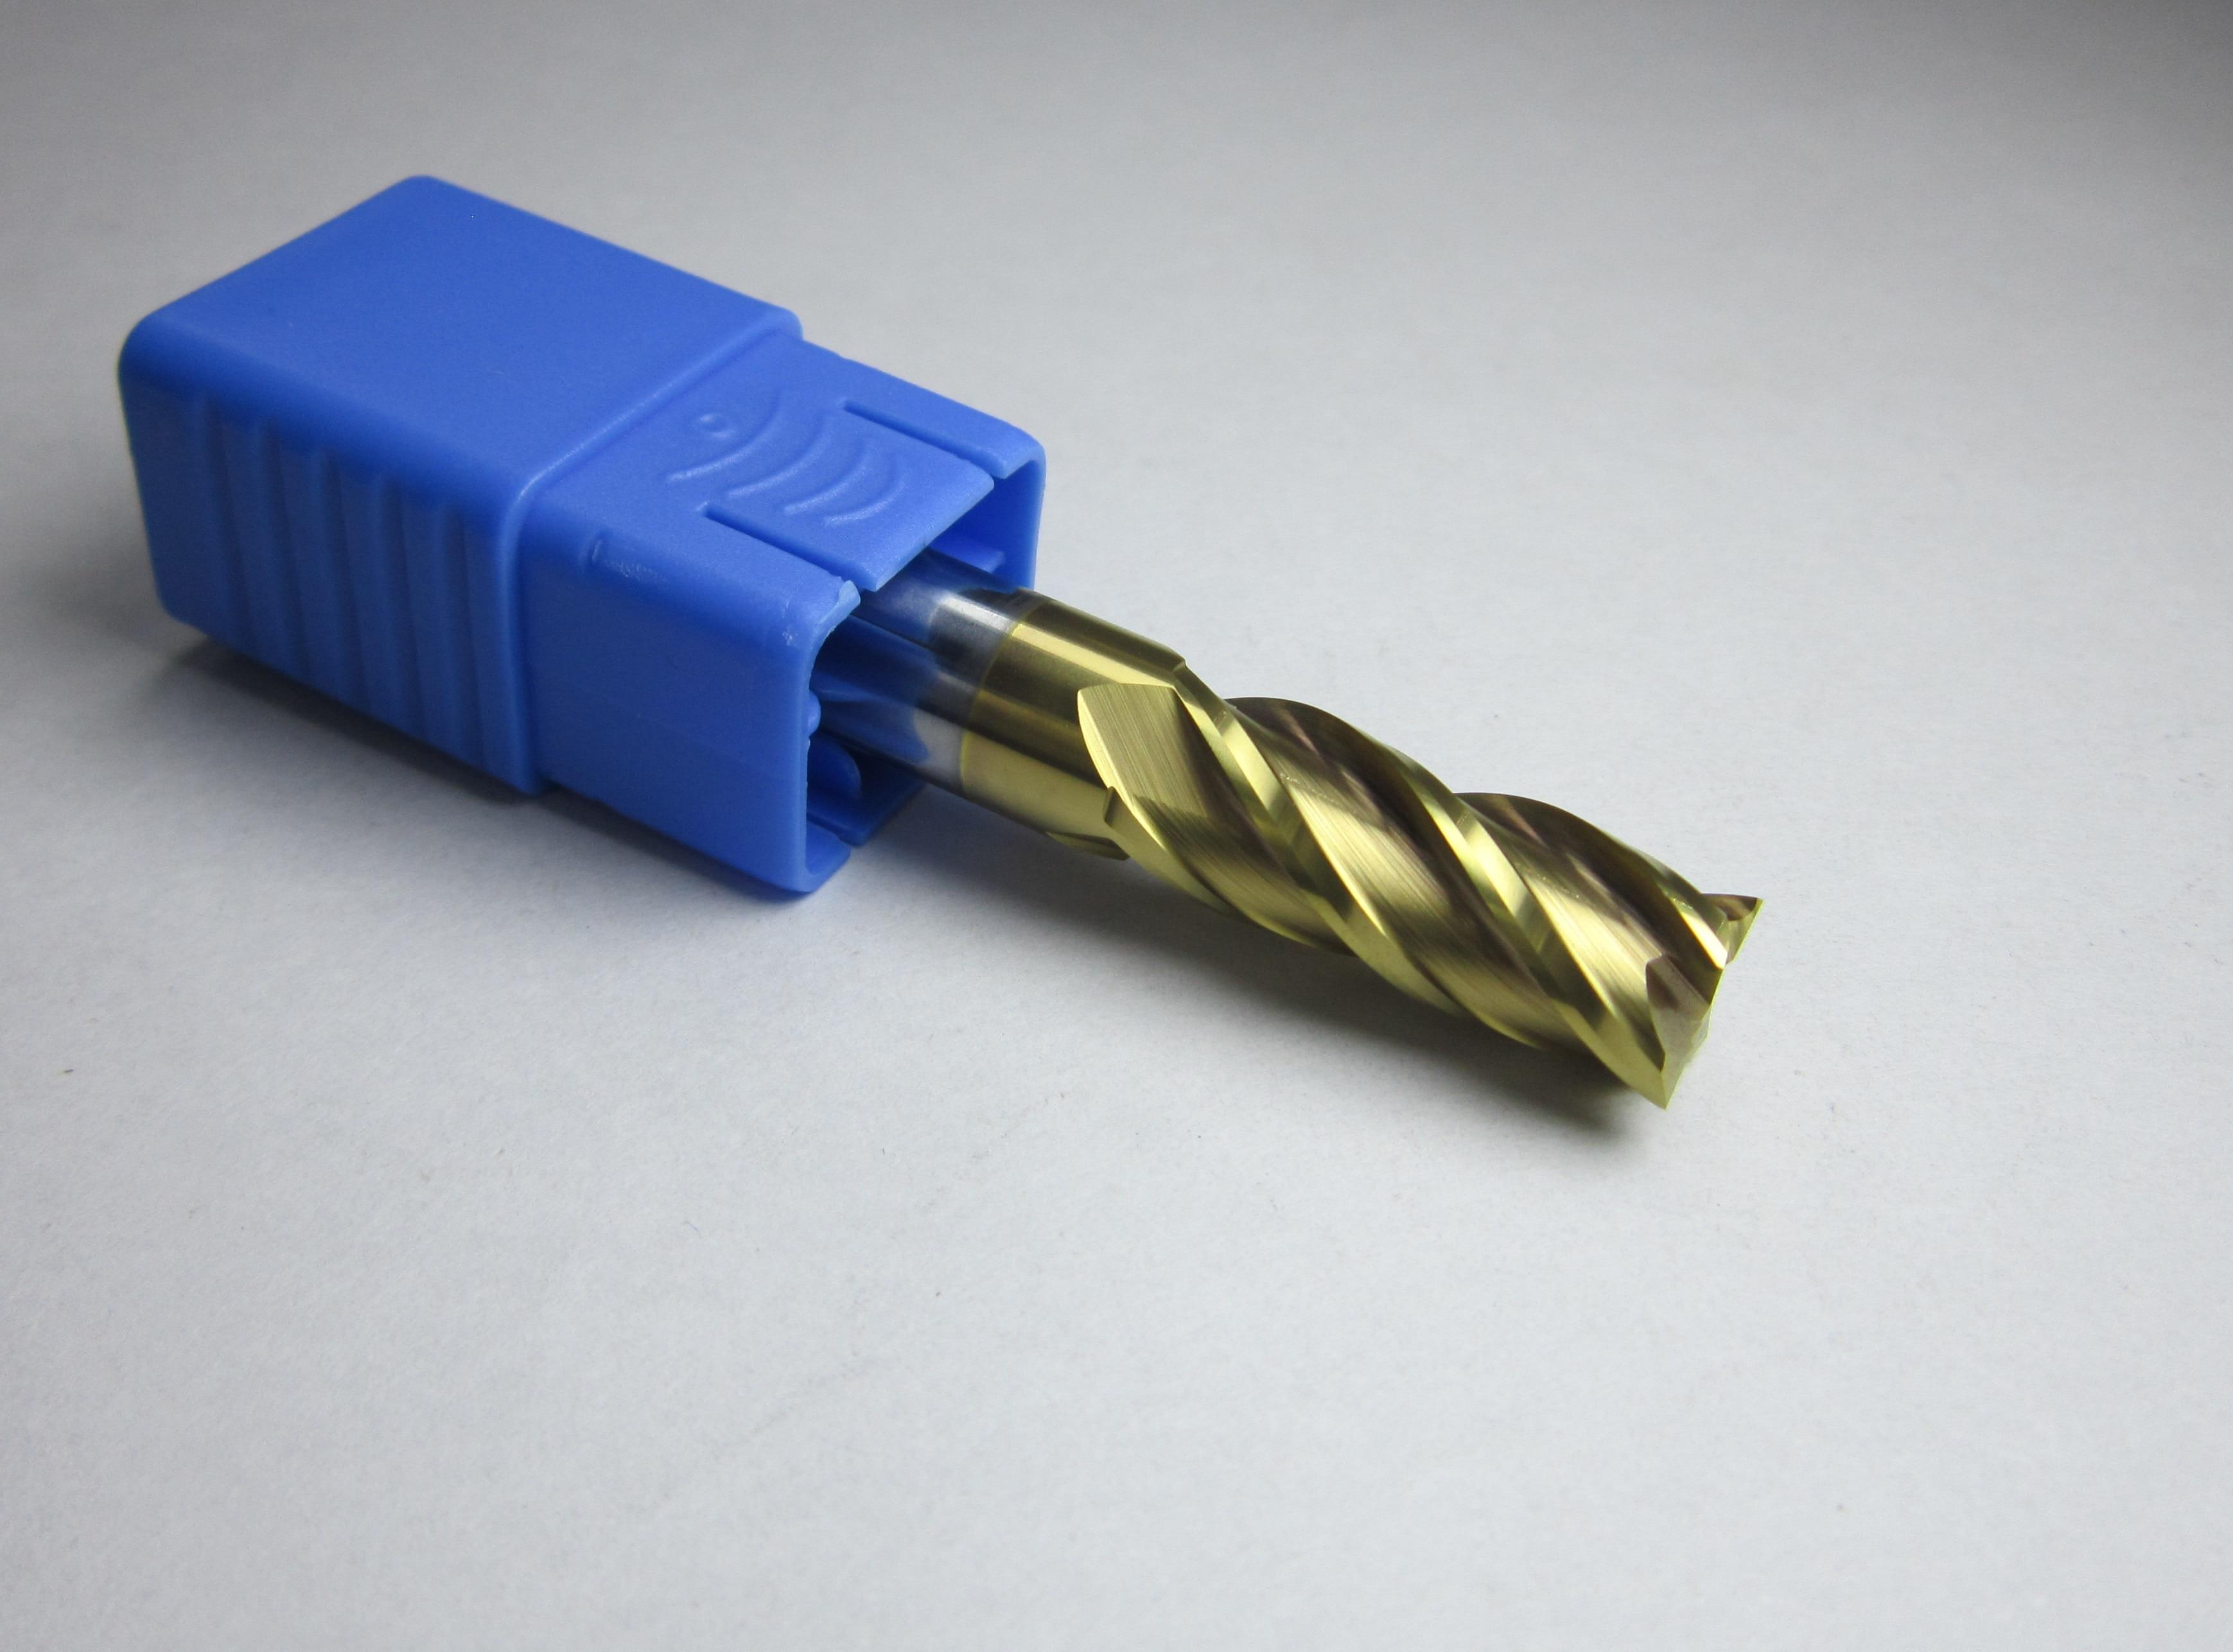 Ø 10mm HRC45 2 flutes Carbide End Mills CNC machine milling cutter bit for steel